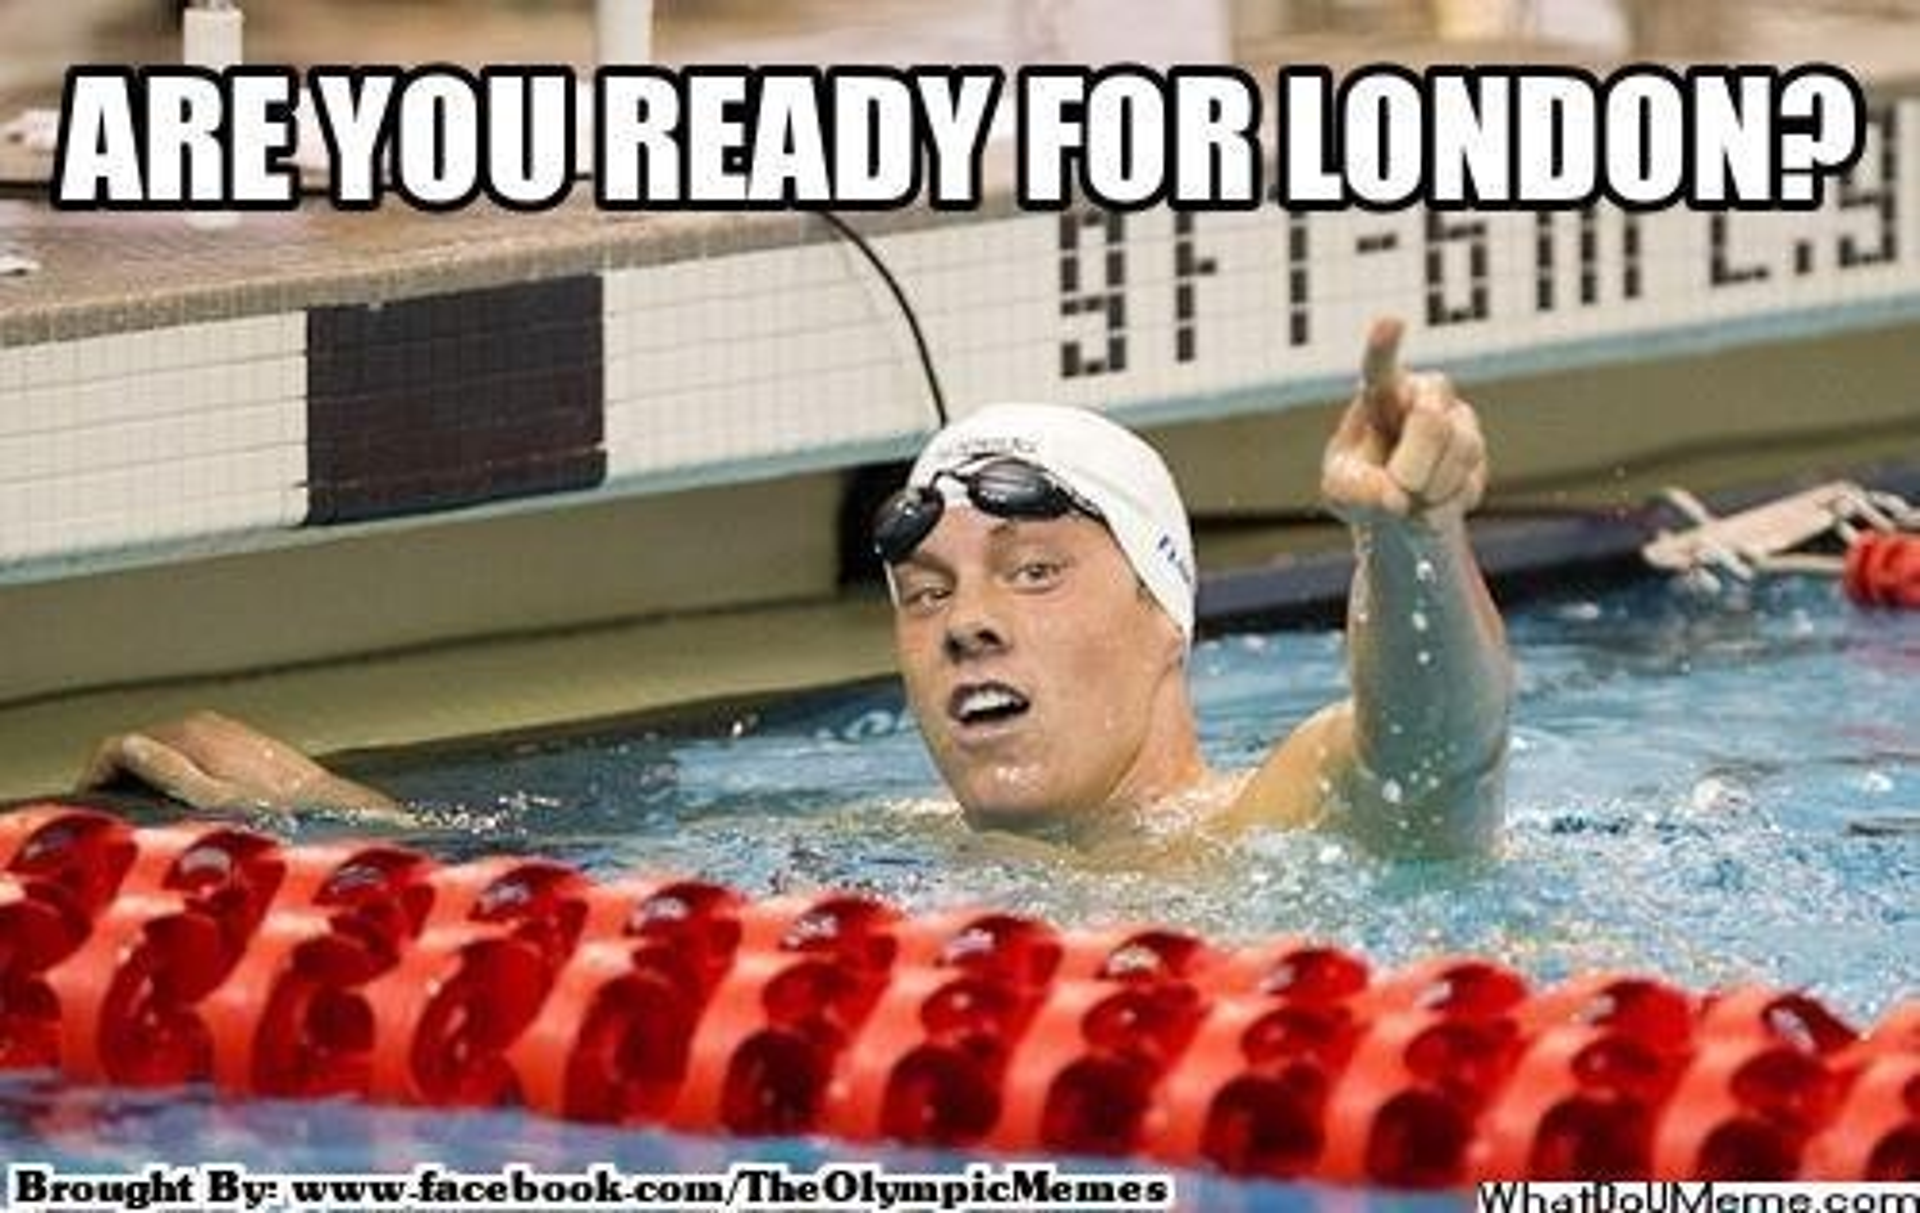 7tw6cstf 1342069683?ixlib=rb 1.1.0&q=45&auto=format&w=926&fit=clip meme team olympic fandom meets the internet